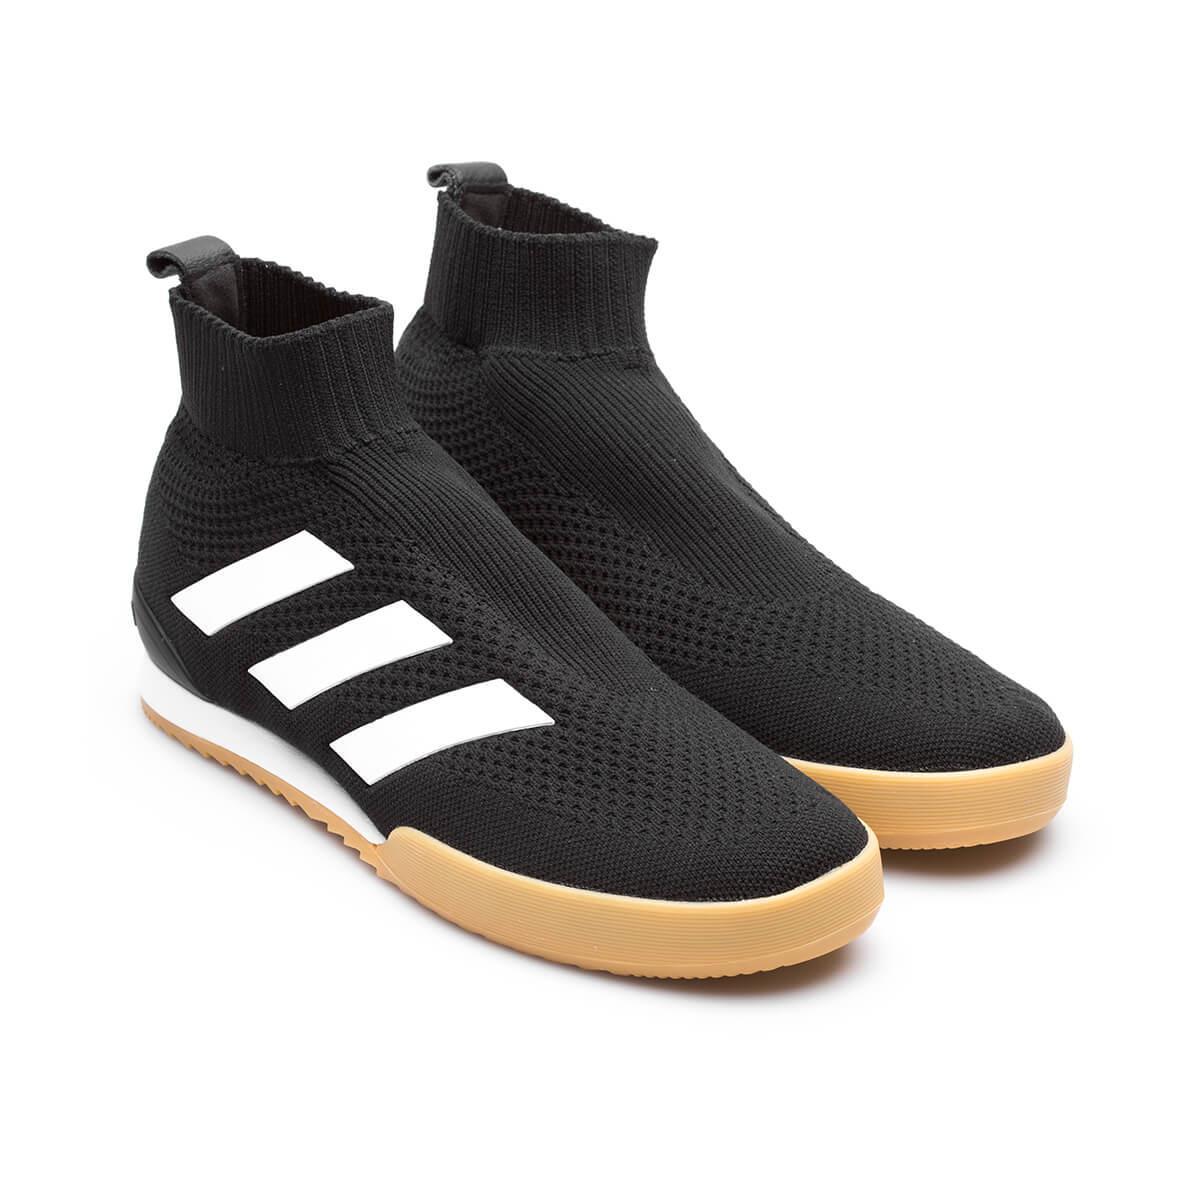 buy online 98aa2 766c5 ... Lyst - Gosha Rubchinskiy Scarpa X Adidas Ace 16+ Sneakers in ...